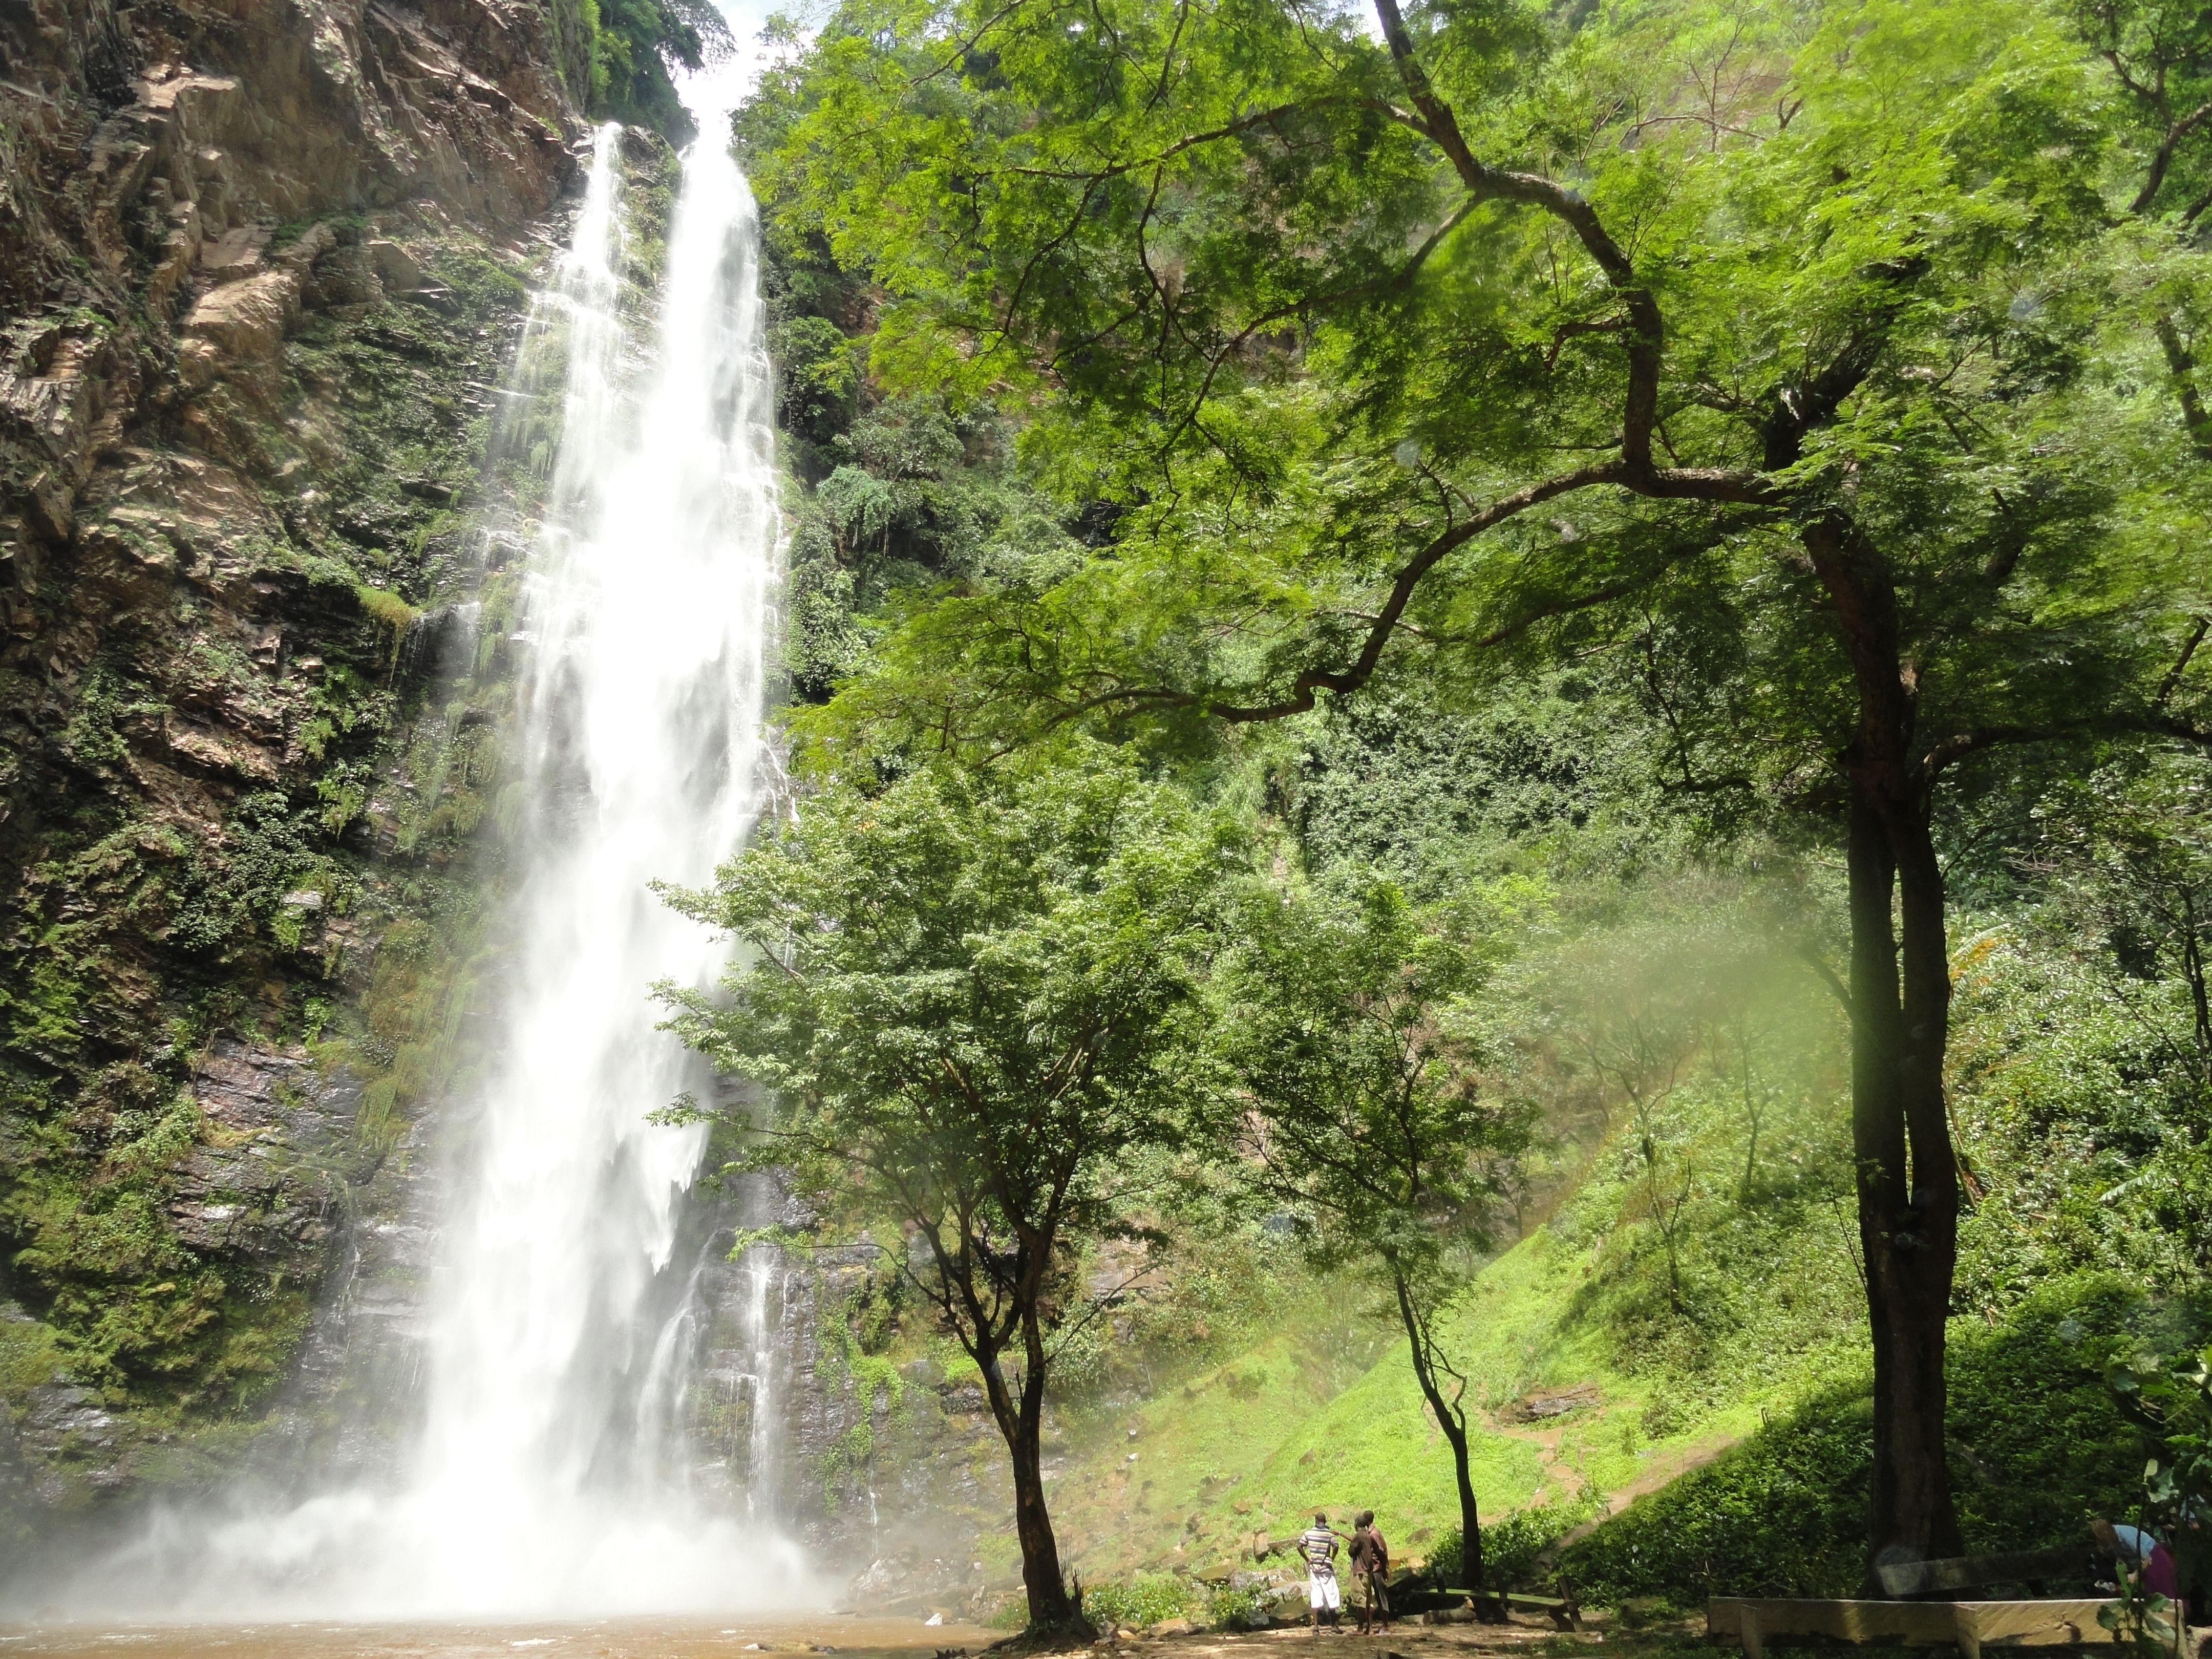 Wli Waterfalls Near Hohoe Ghana Waterfall Beautiful Sites Travel Abroad